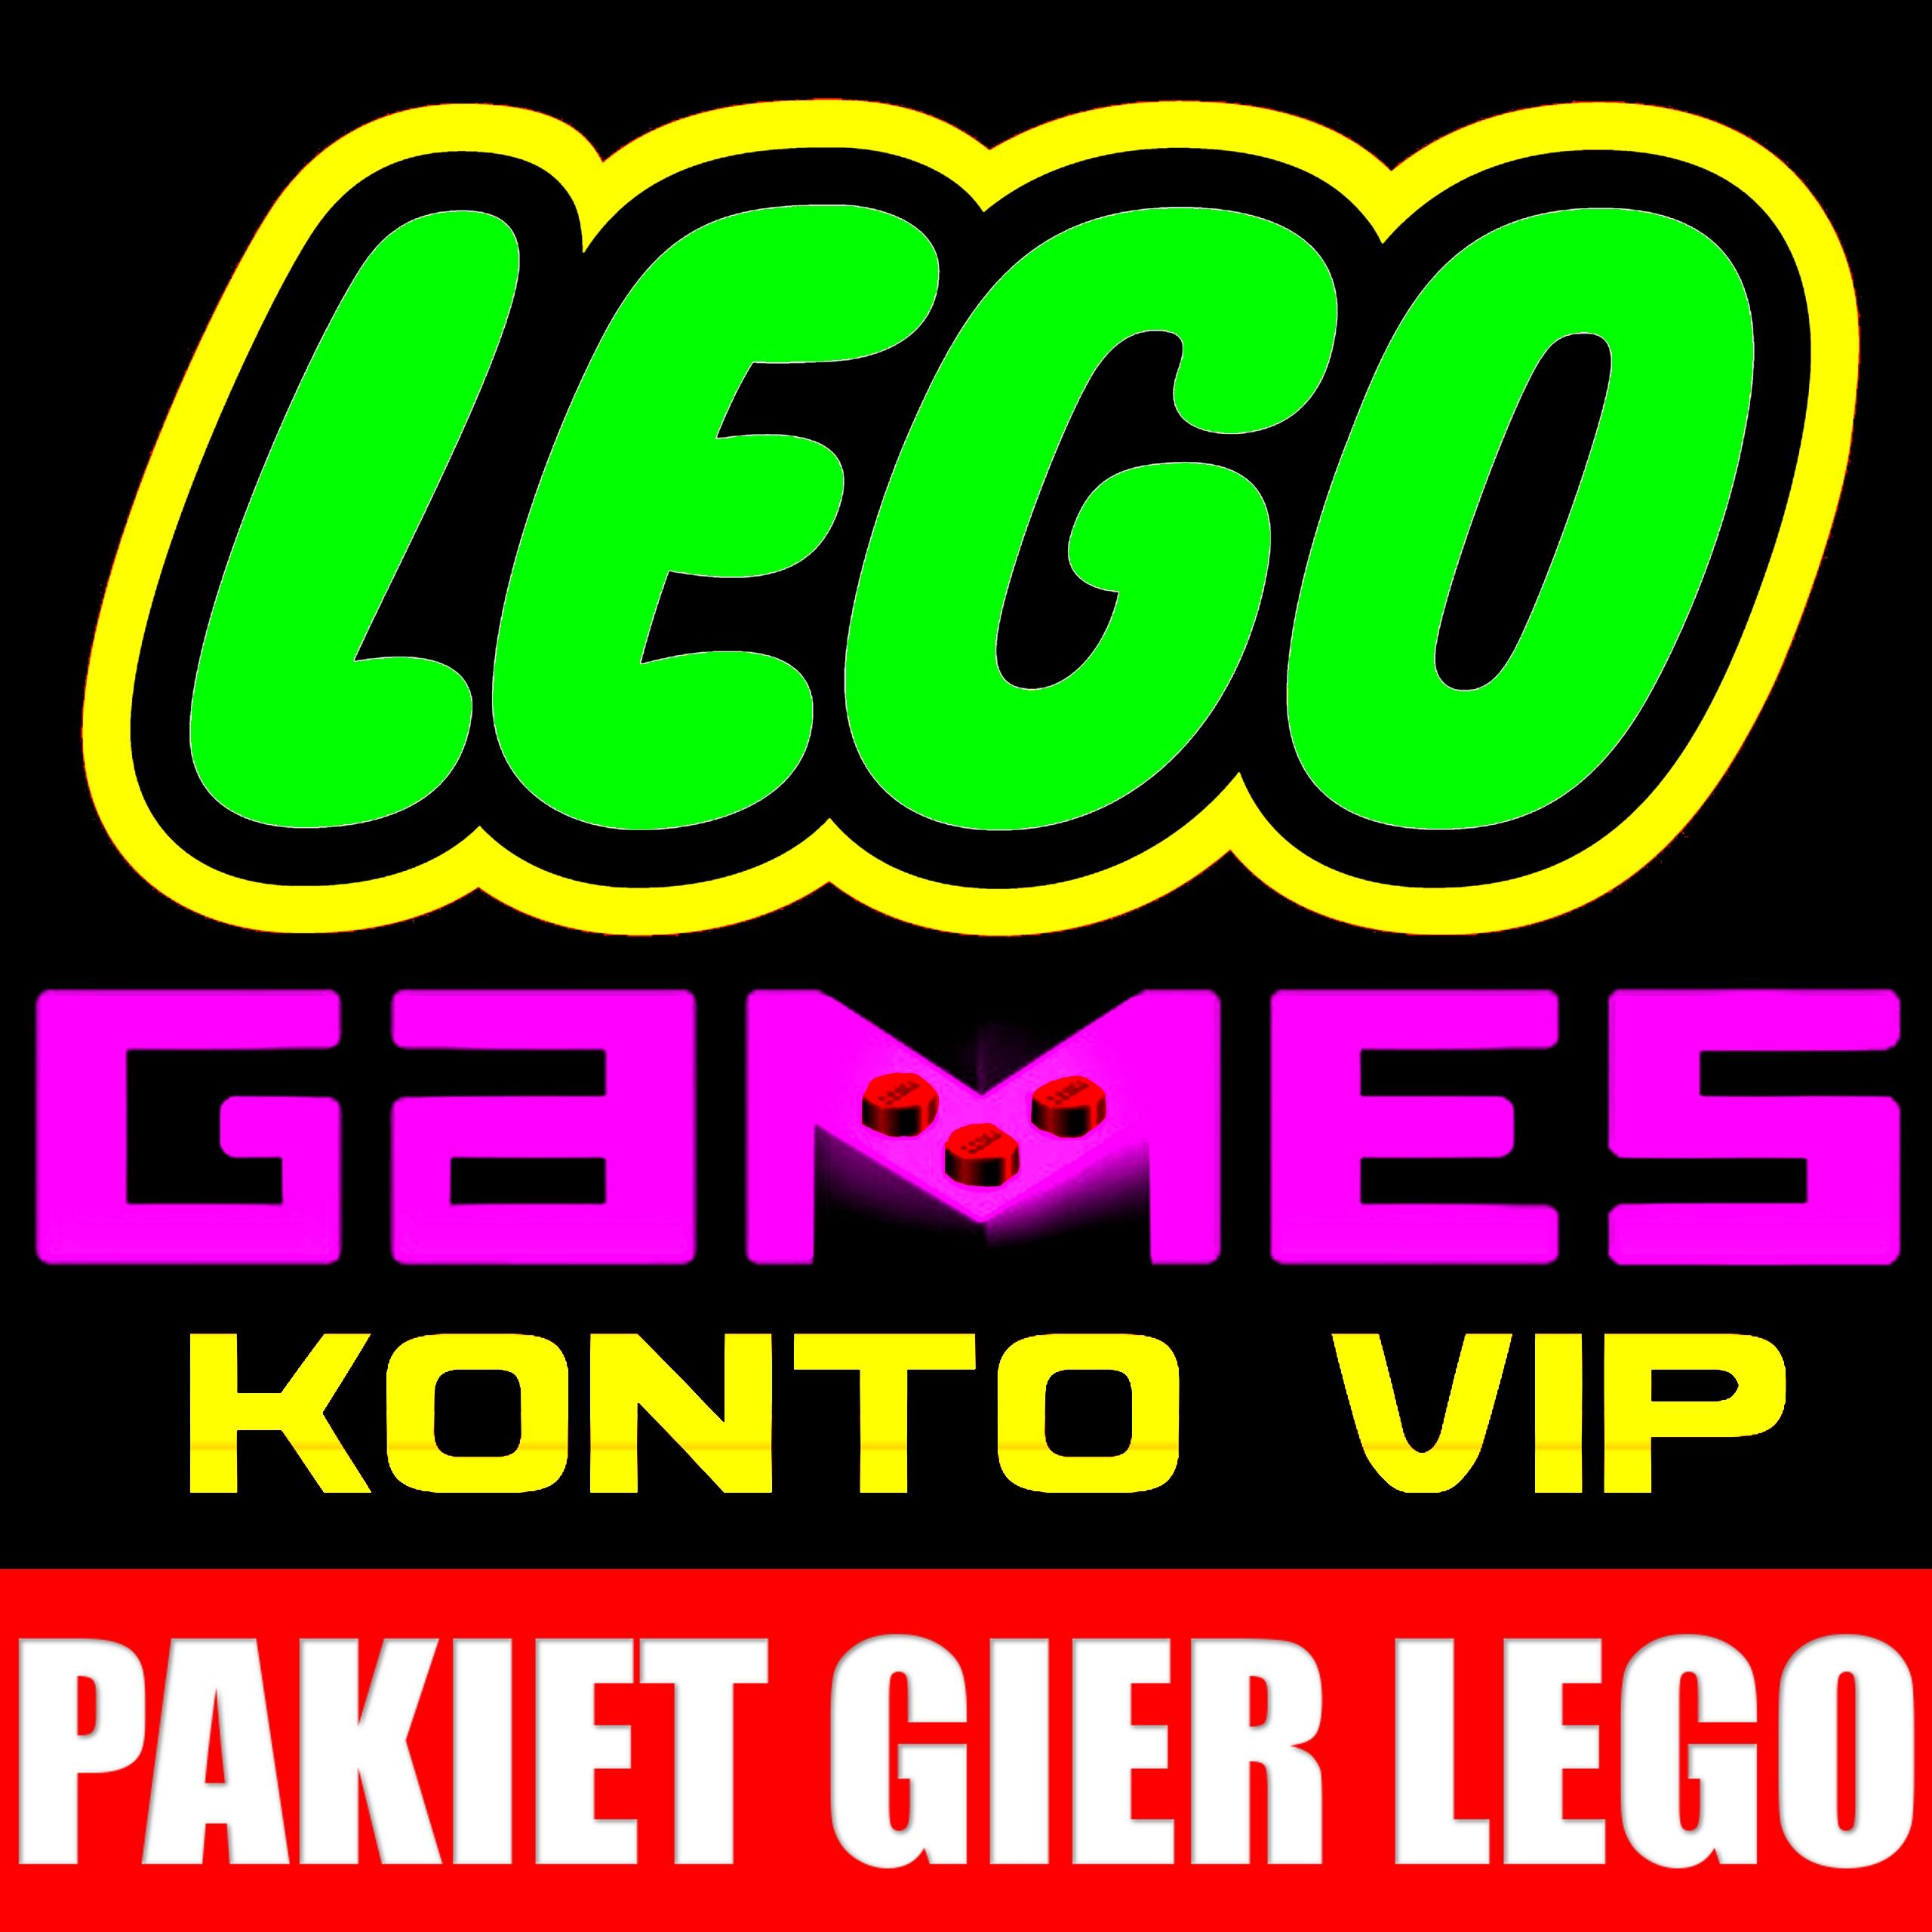 Item LEGO PC ALL PARTS 1 2 3 4 5 6 MEGA PACK